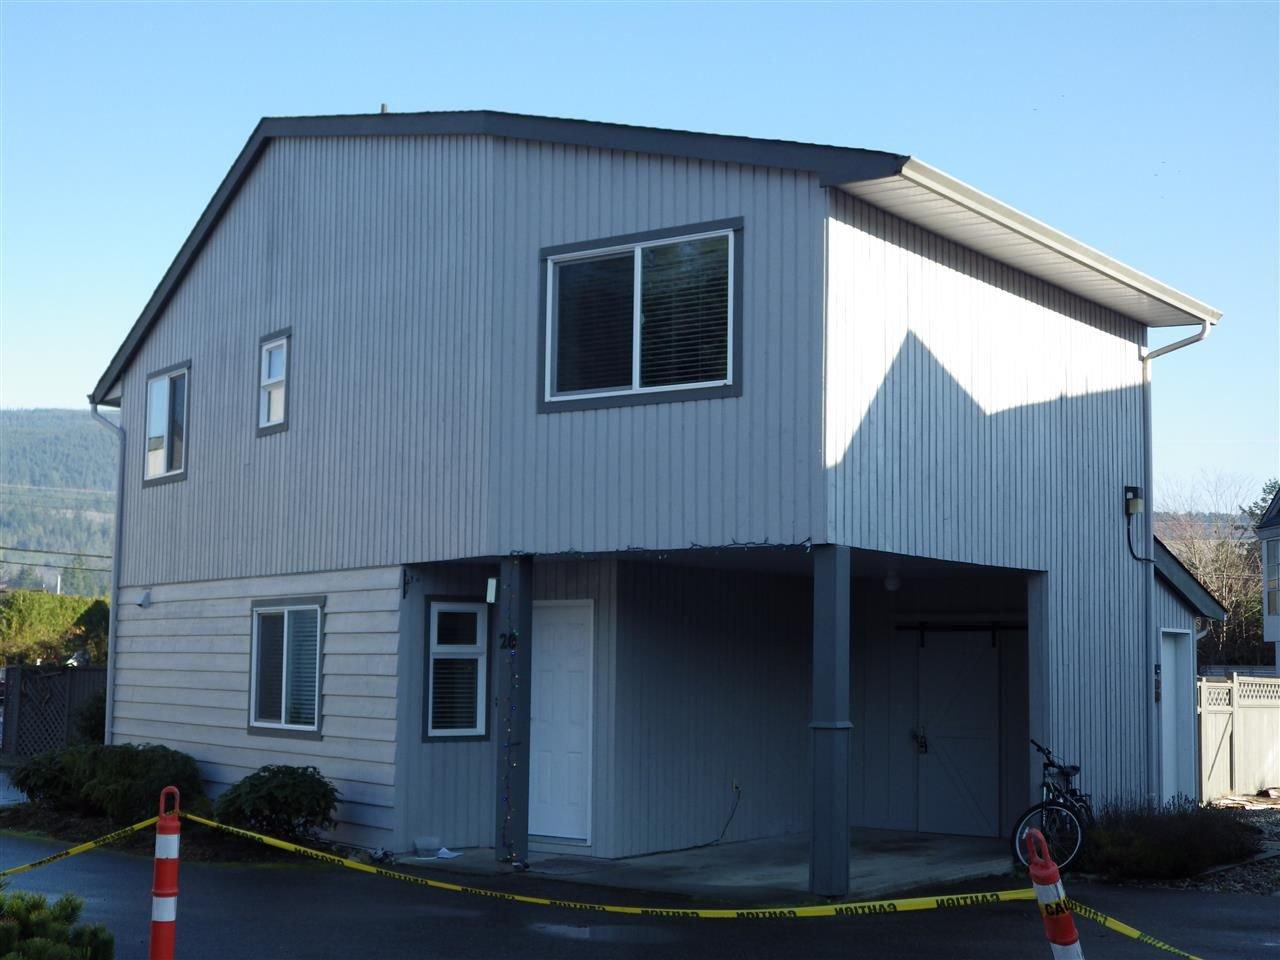 Main Photo: 20 5761 WHARF Avenue in Sechelt: Sechelt District House 1/2 Duplex for sale (Sunshine Coast)  : MLS®# R2227749